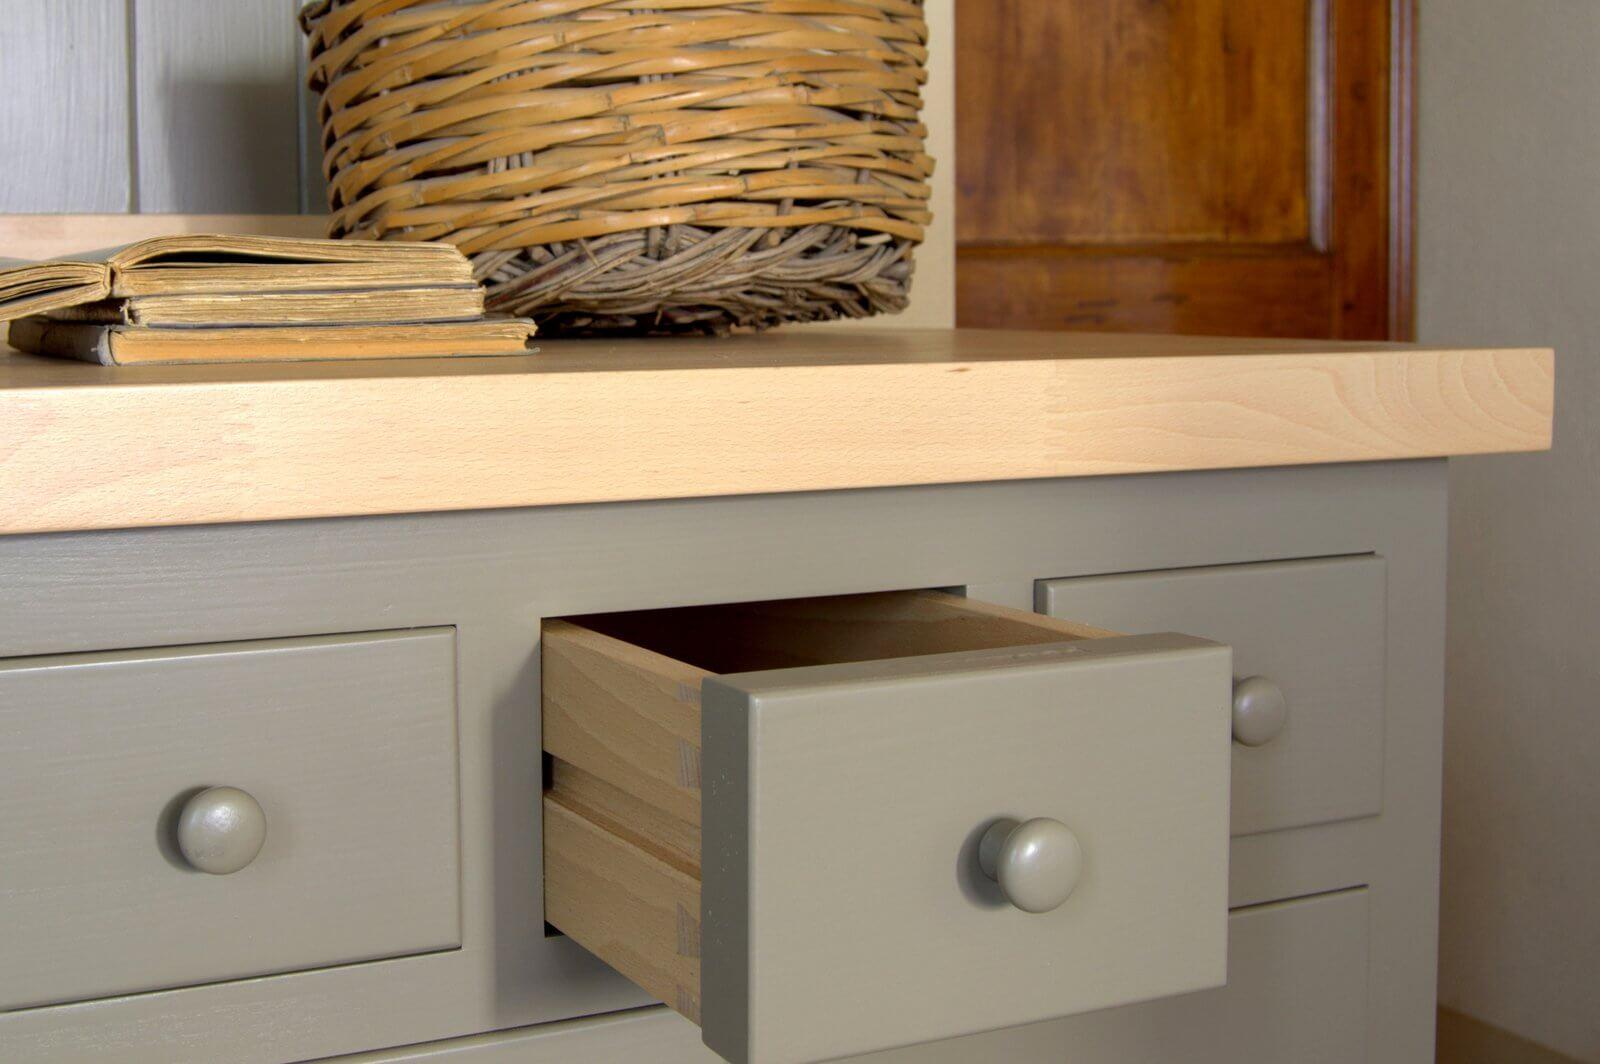 La cucina in stile shaker for Bespoke kitchen cabinets